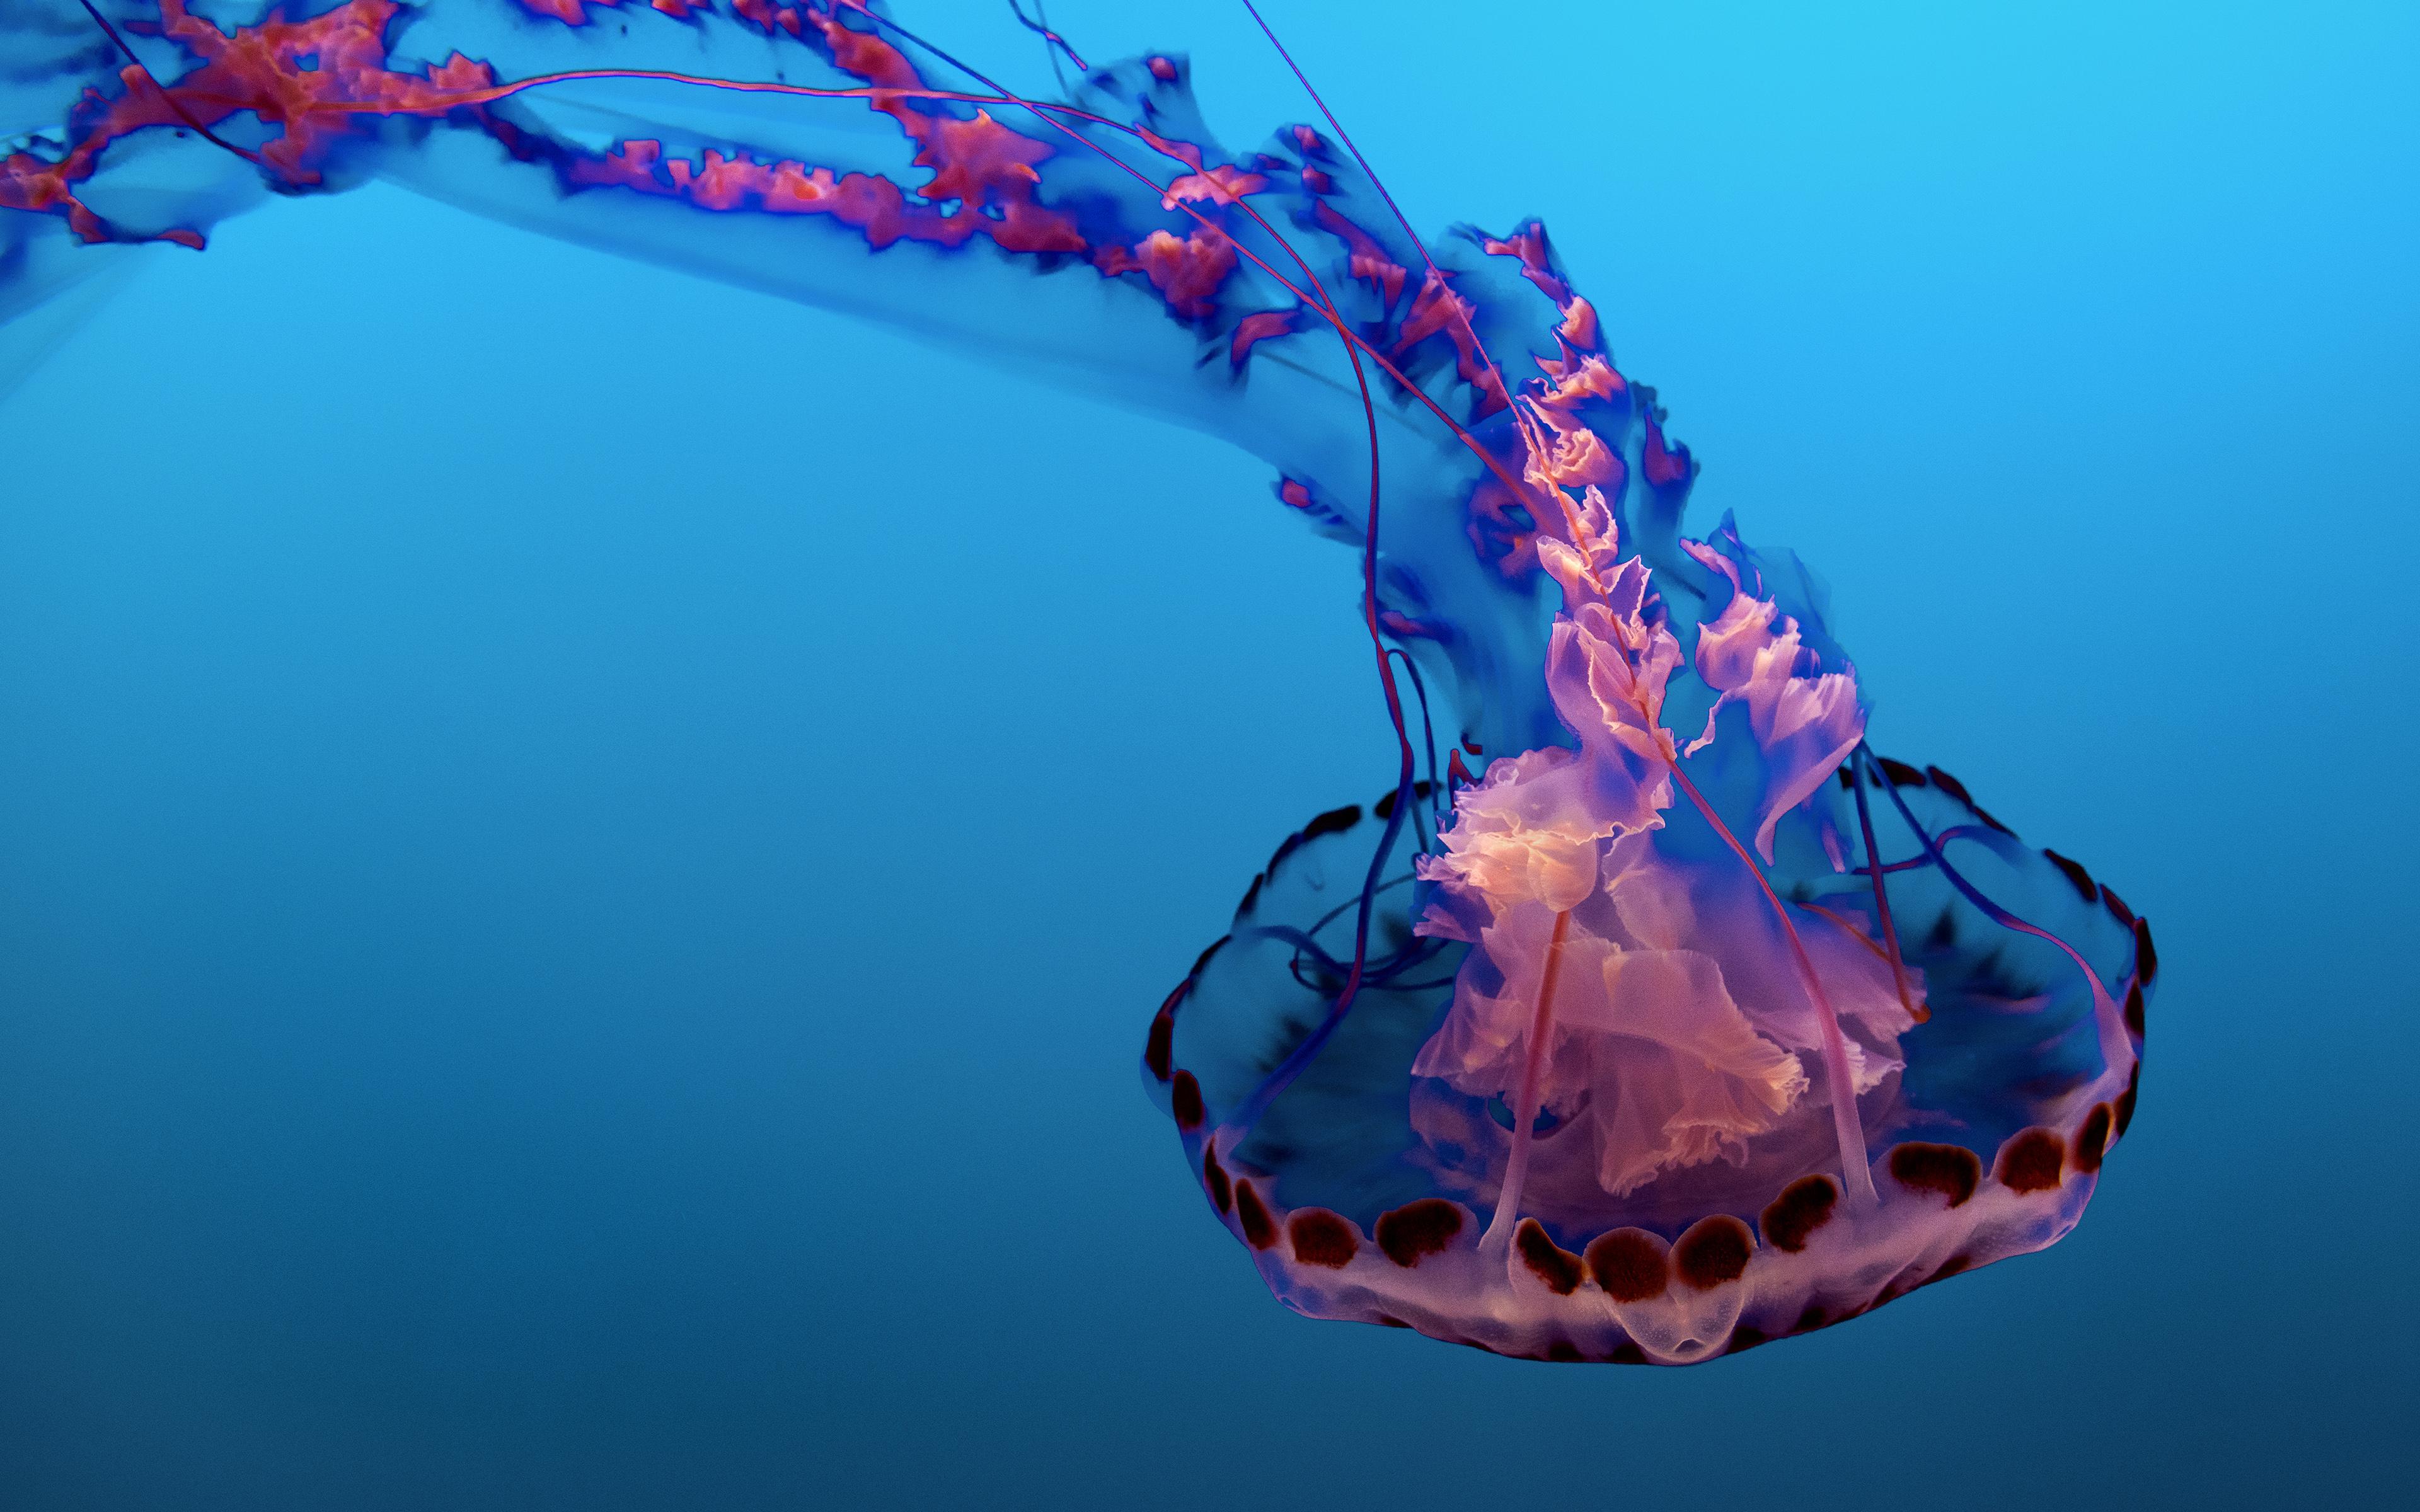 Underwater Jellyfish 4k 8k Sea Life 80384 Hd